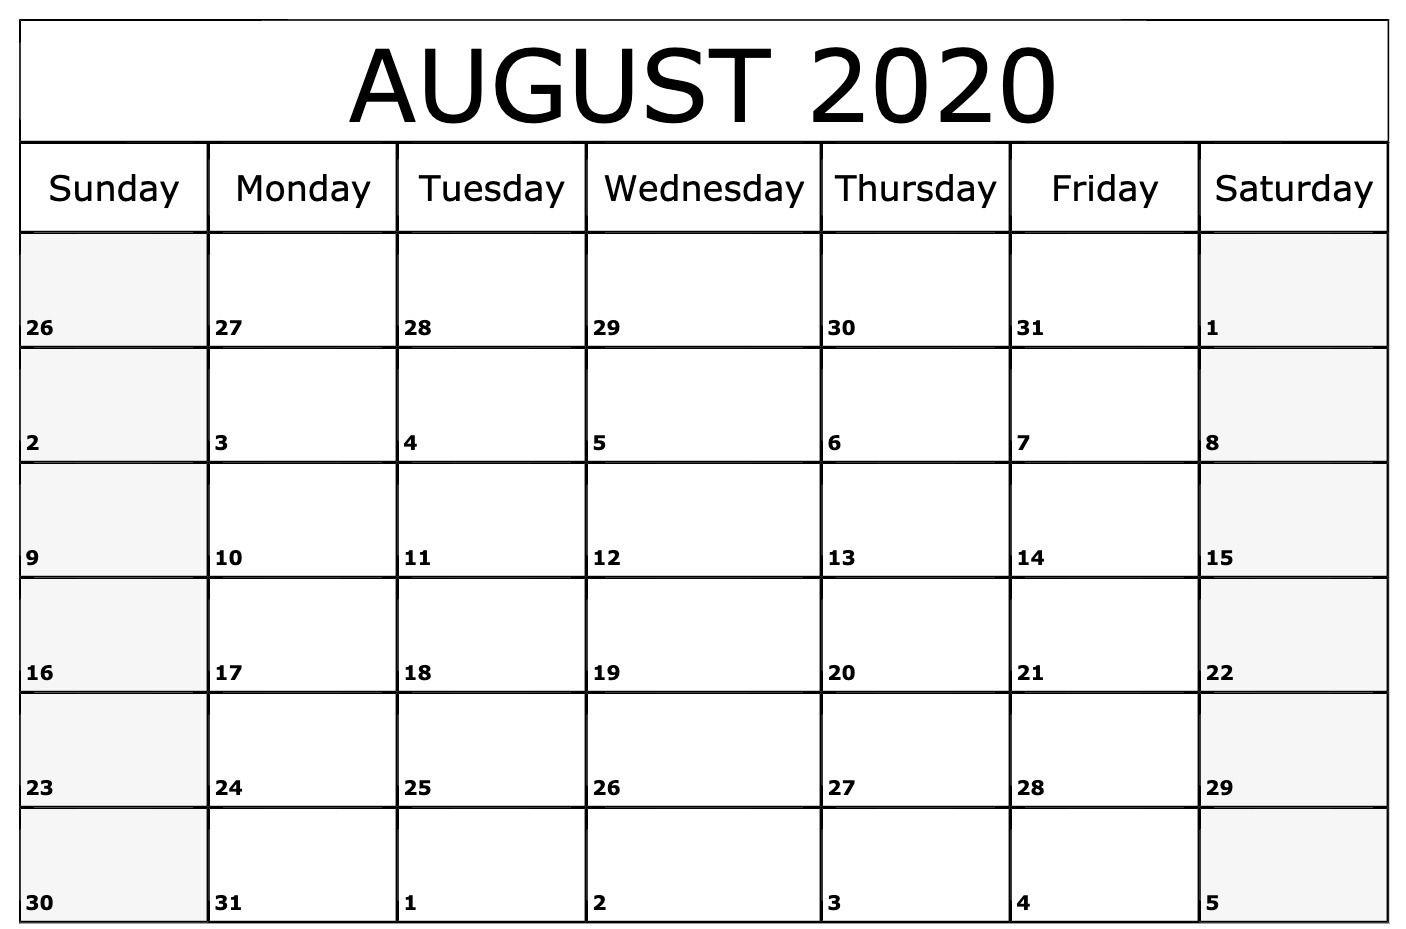 August 2020 Calendar Template | Printable Calendar Template